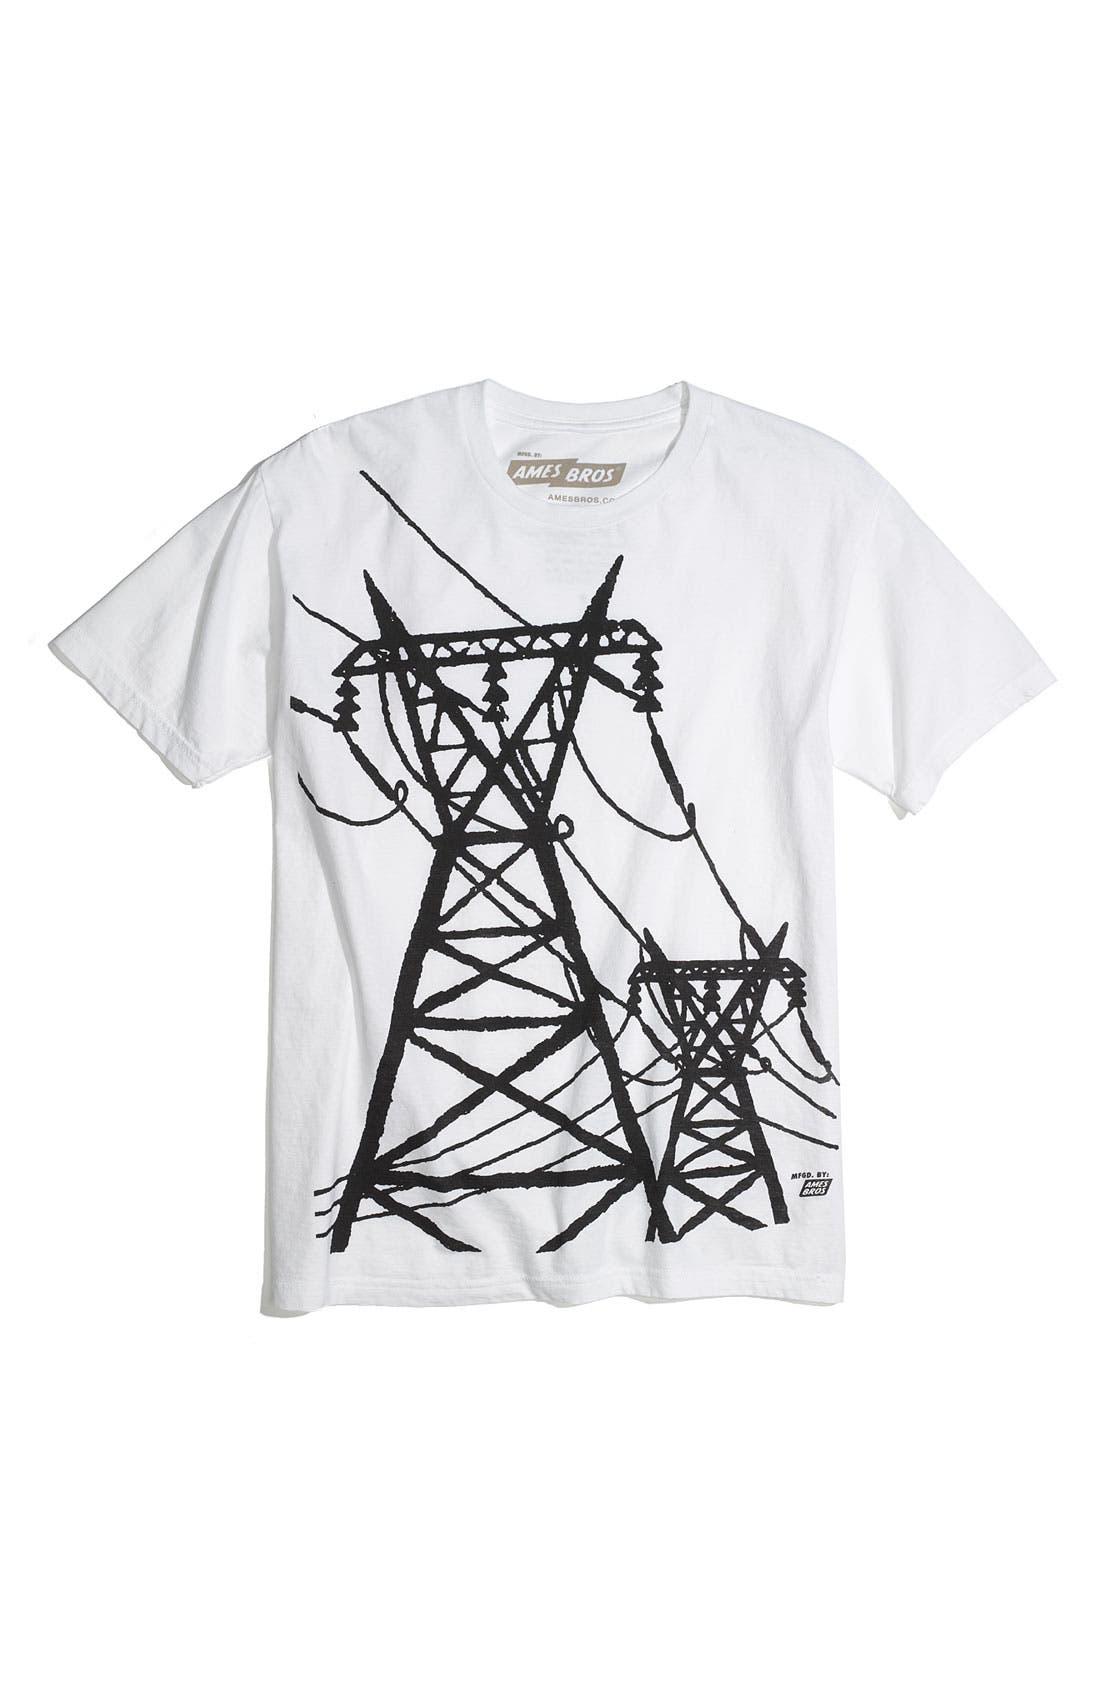 Main Image - Ames Bros 'Get Together' Trim Fit Crewneck T-Shirt (Men)